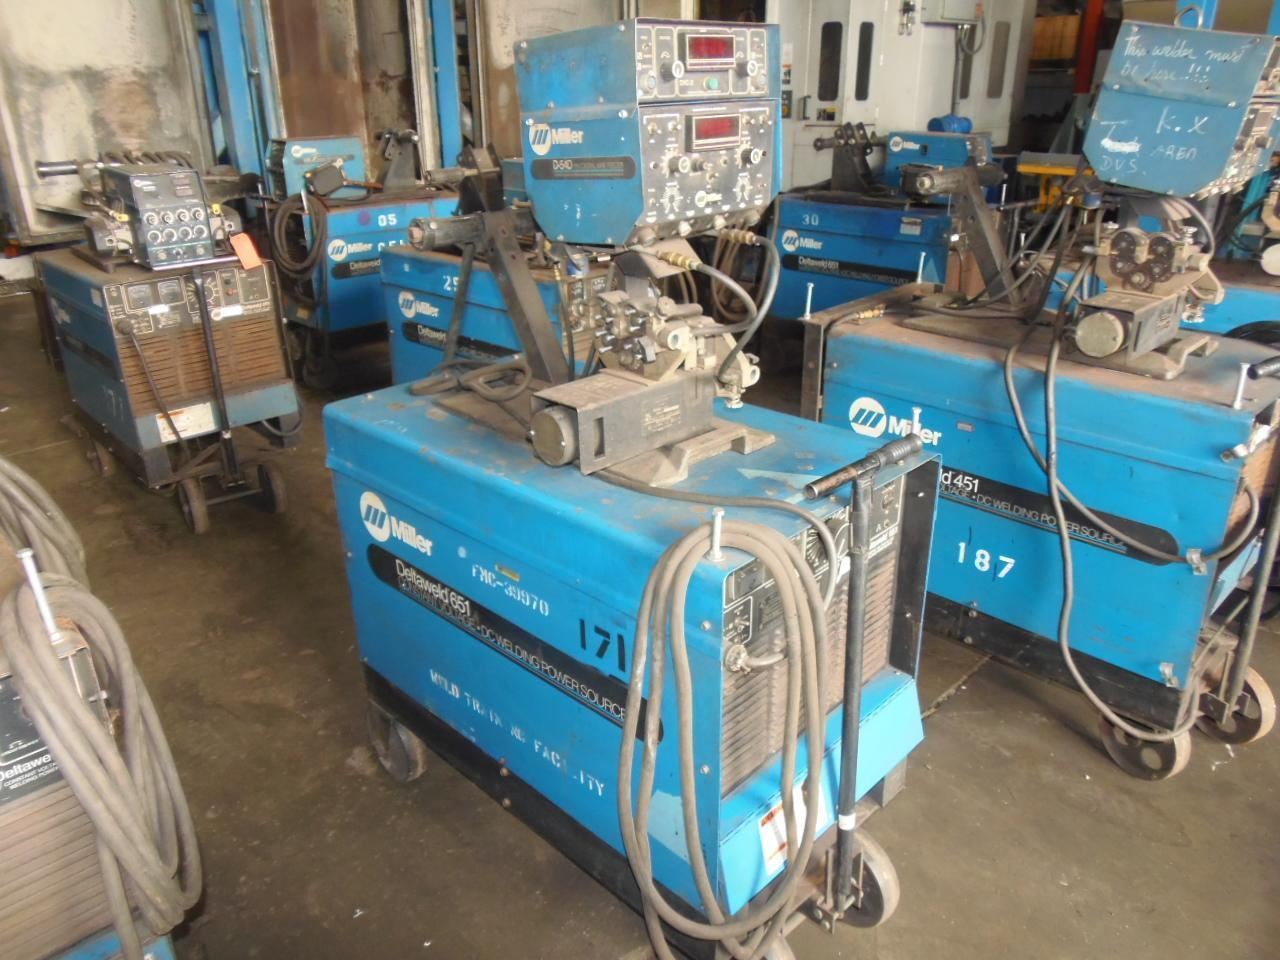 Miller 650 Amp Wire Feed Welder, model Deltaweld 651 with D54 feeder